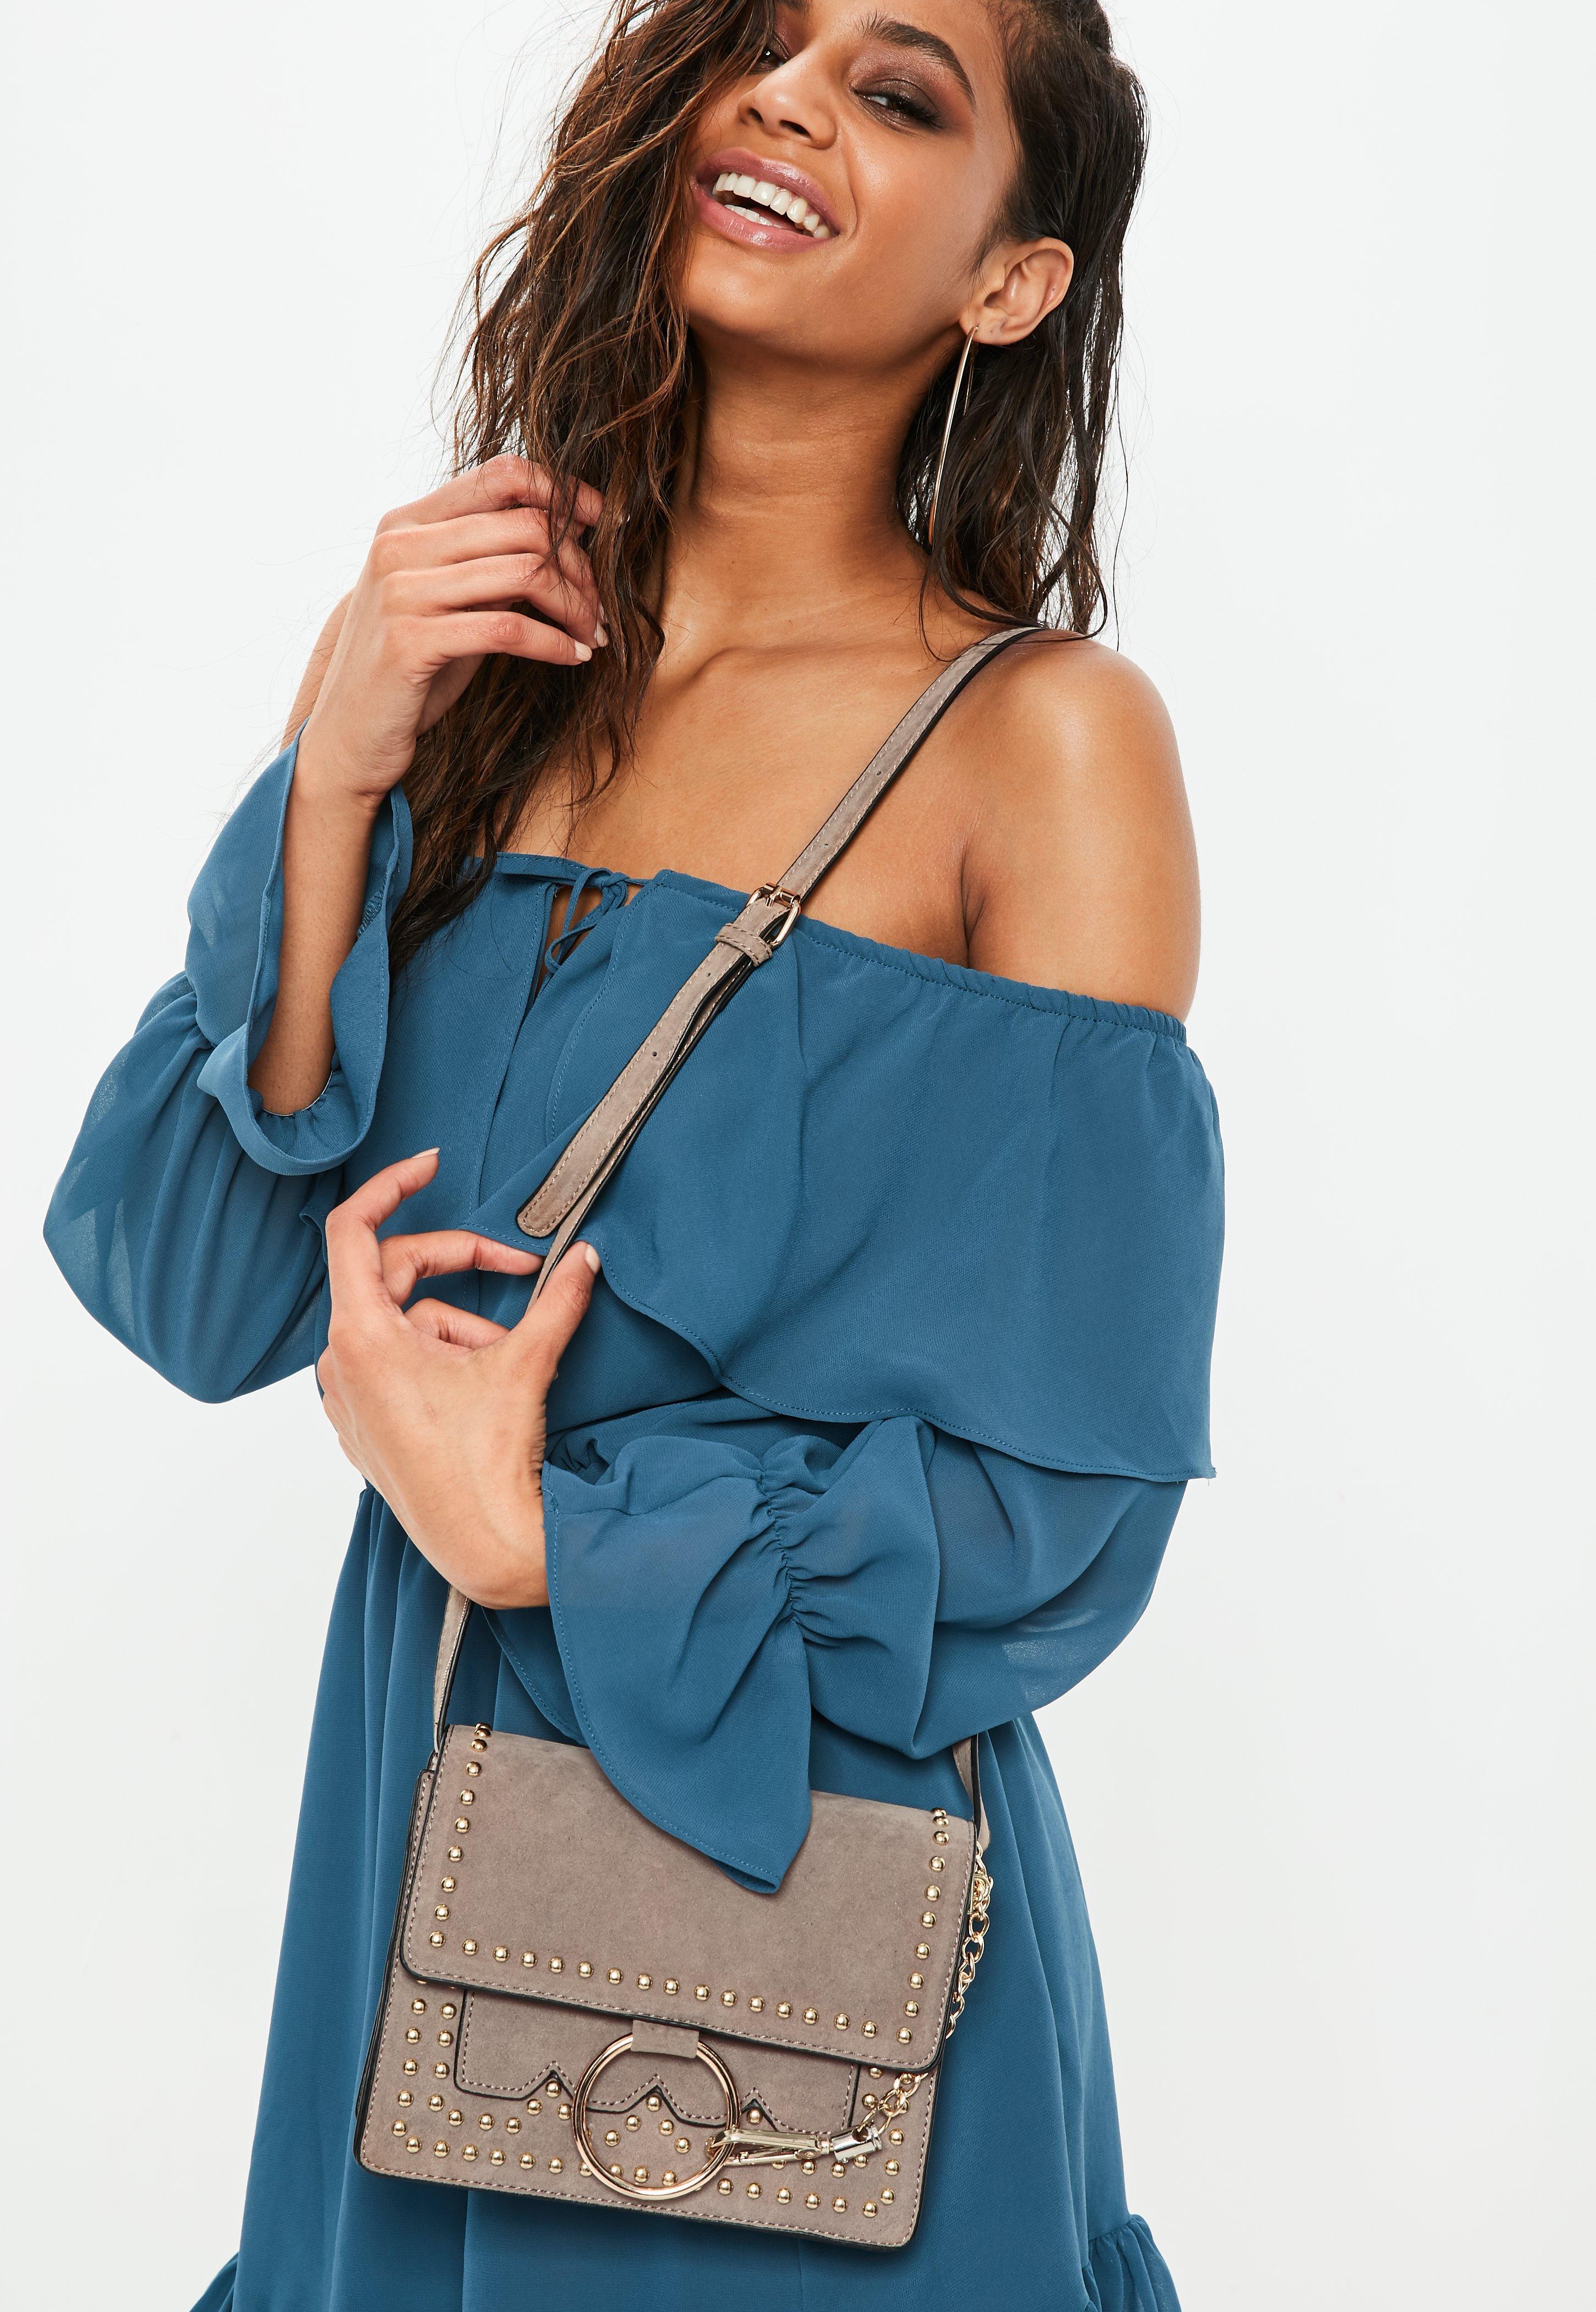 Women\'s Purses & Handbags Online | Missguided